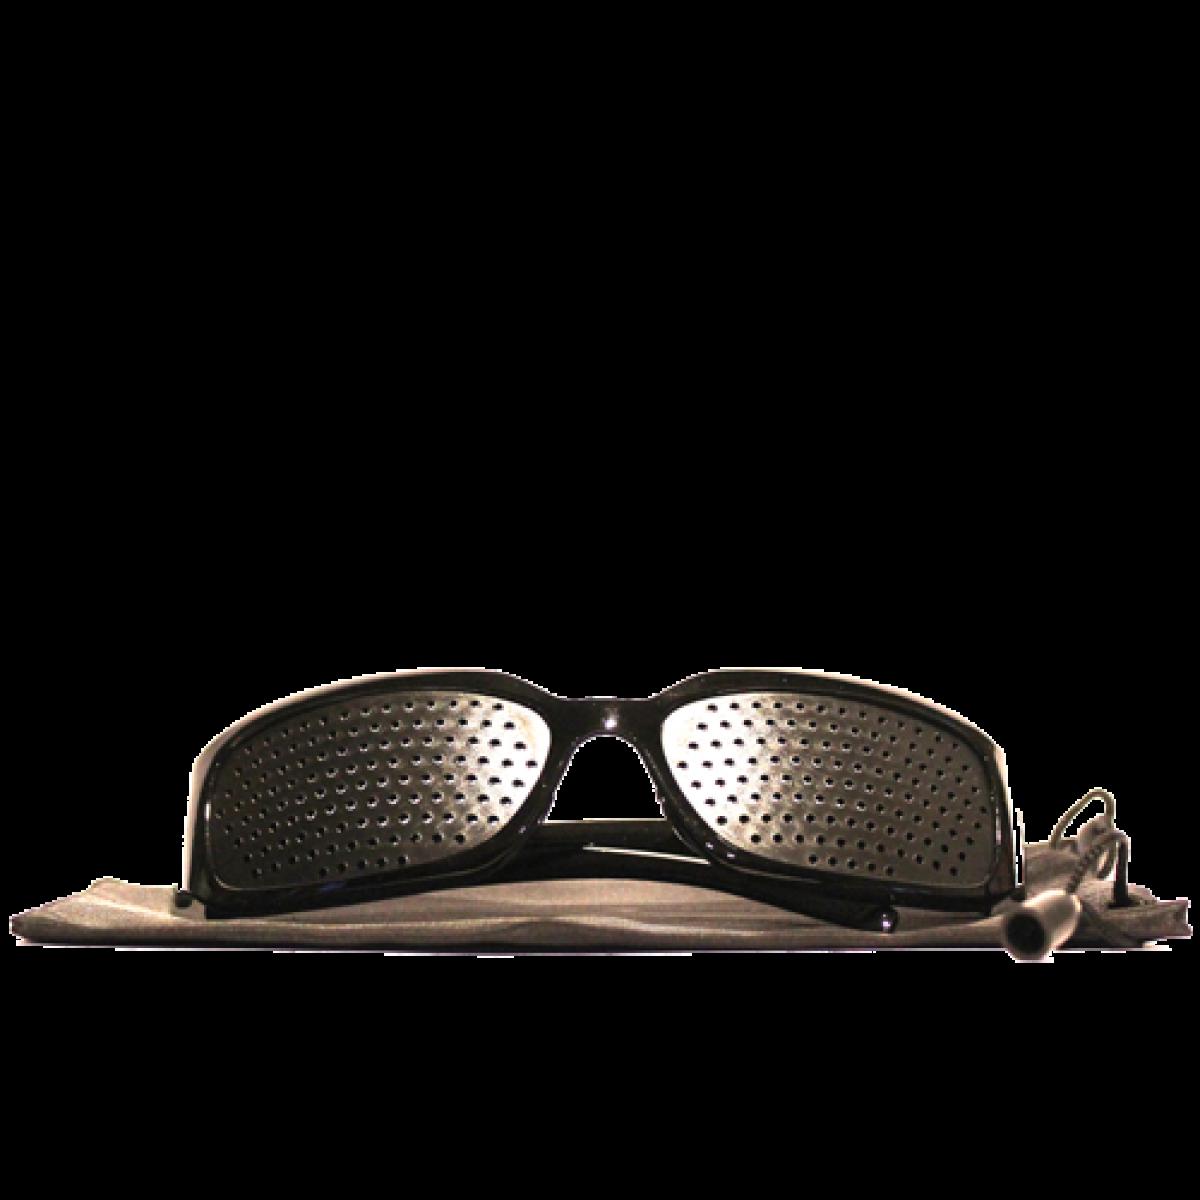 Pinhole Glasses - Health Technologies